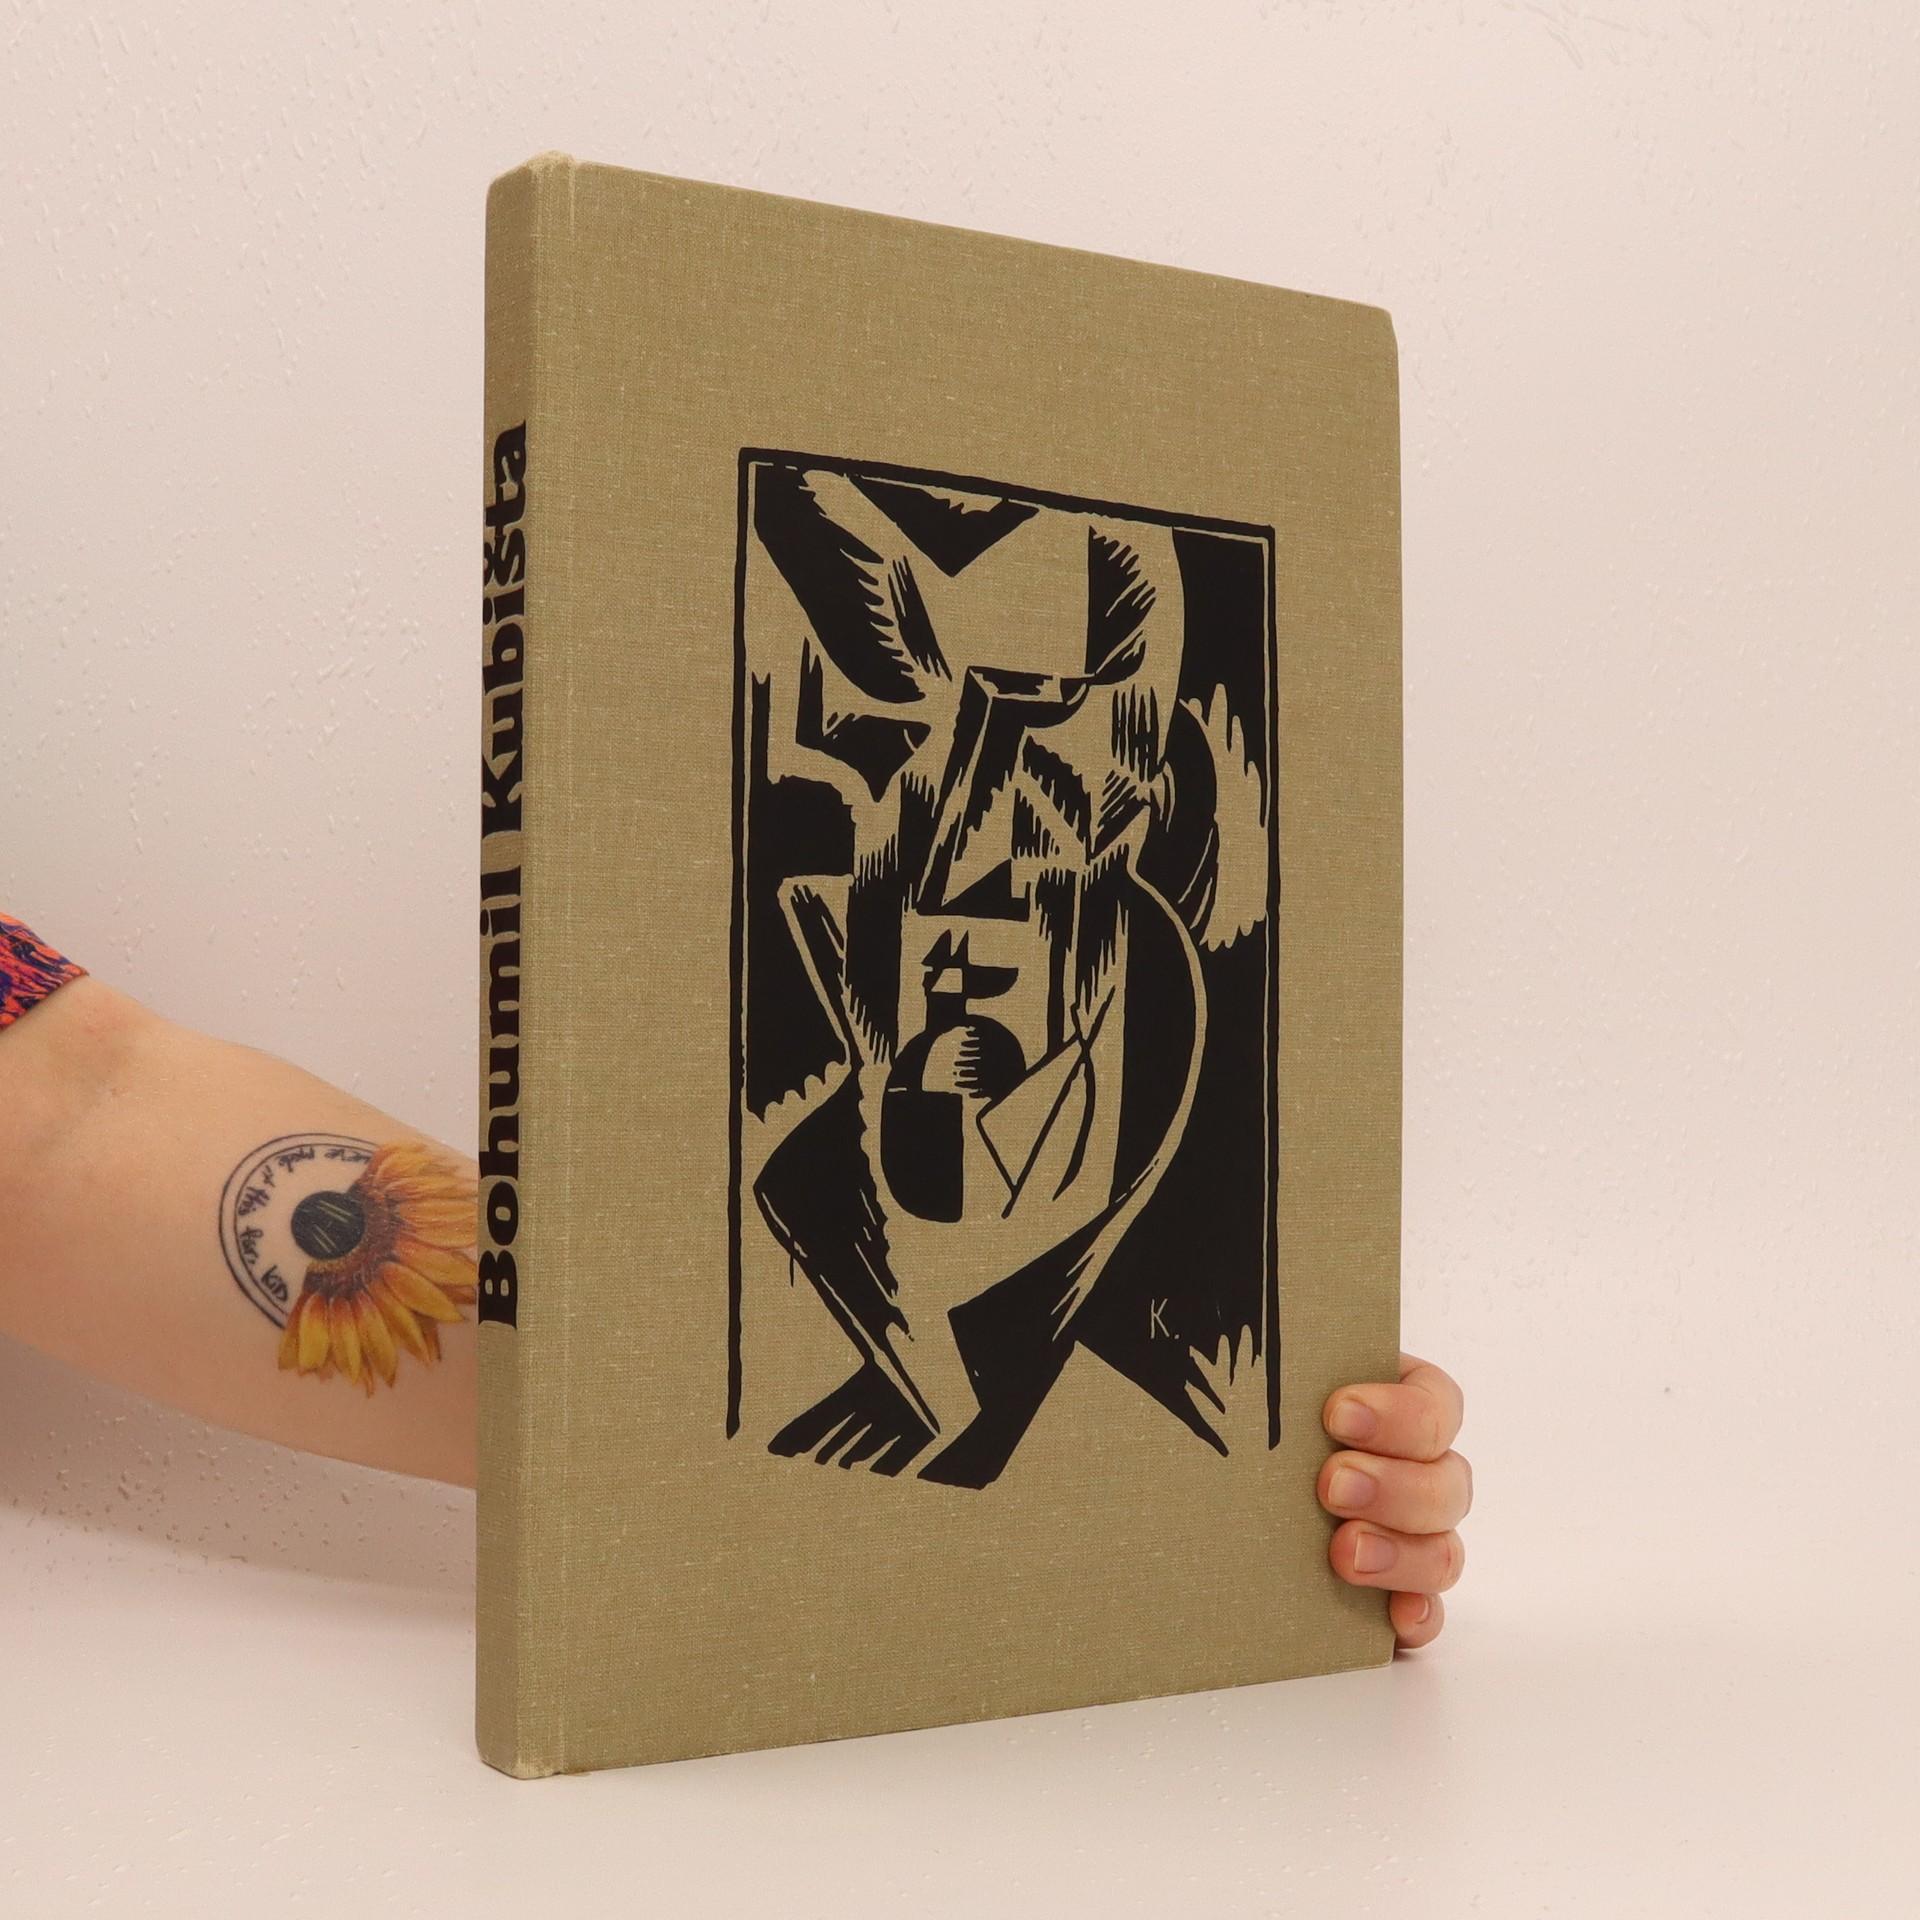 antikvární kniha Bohumil Kubišta, 1993